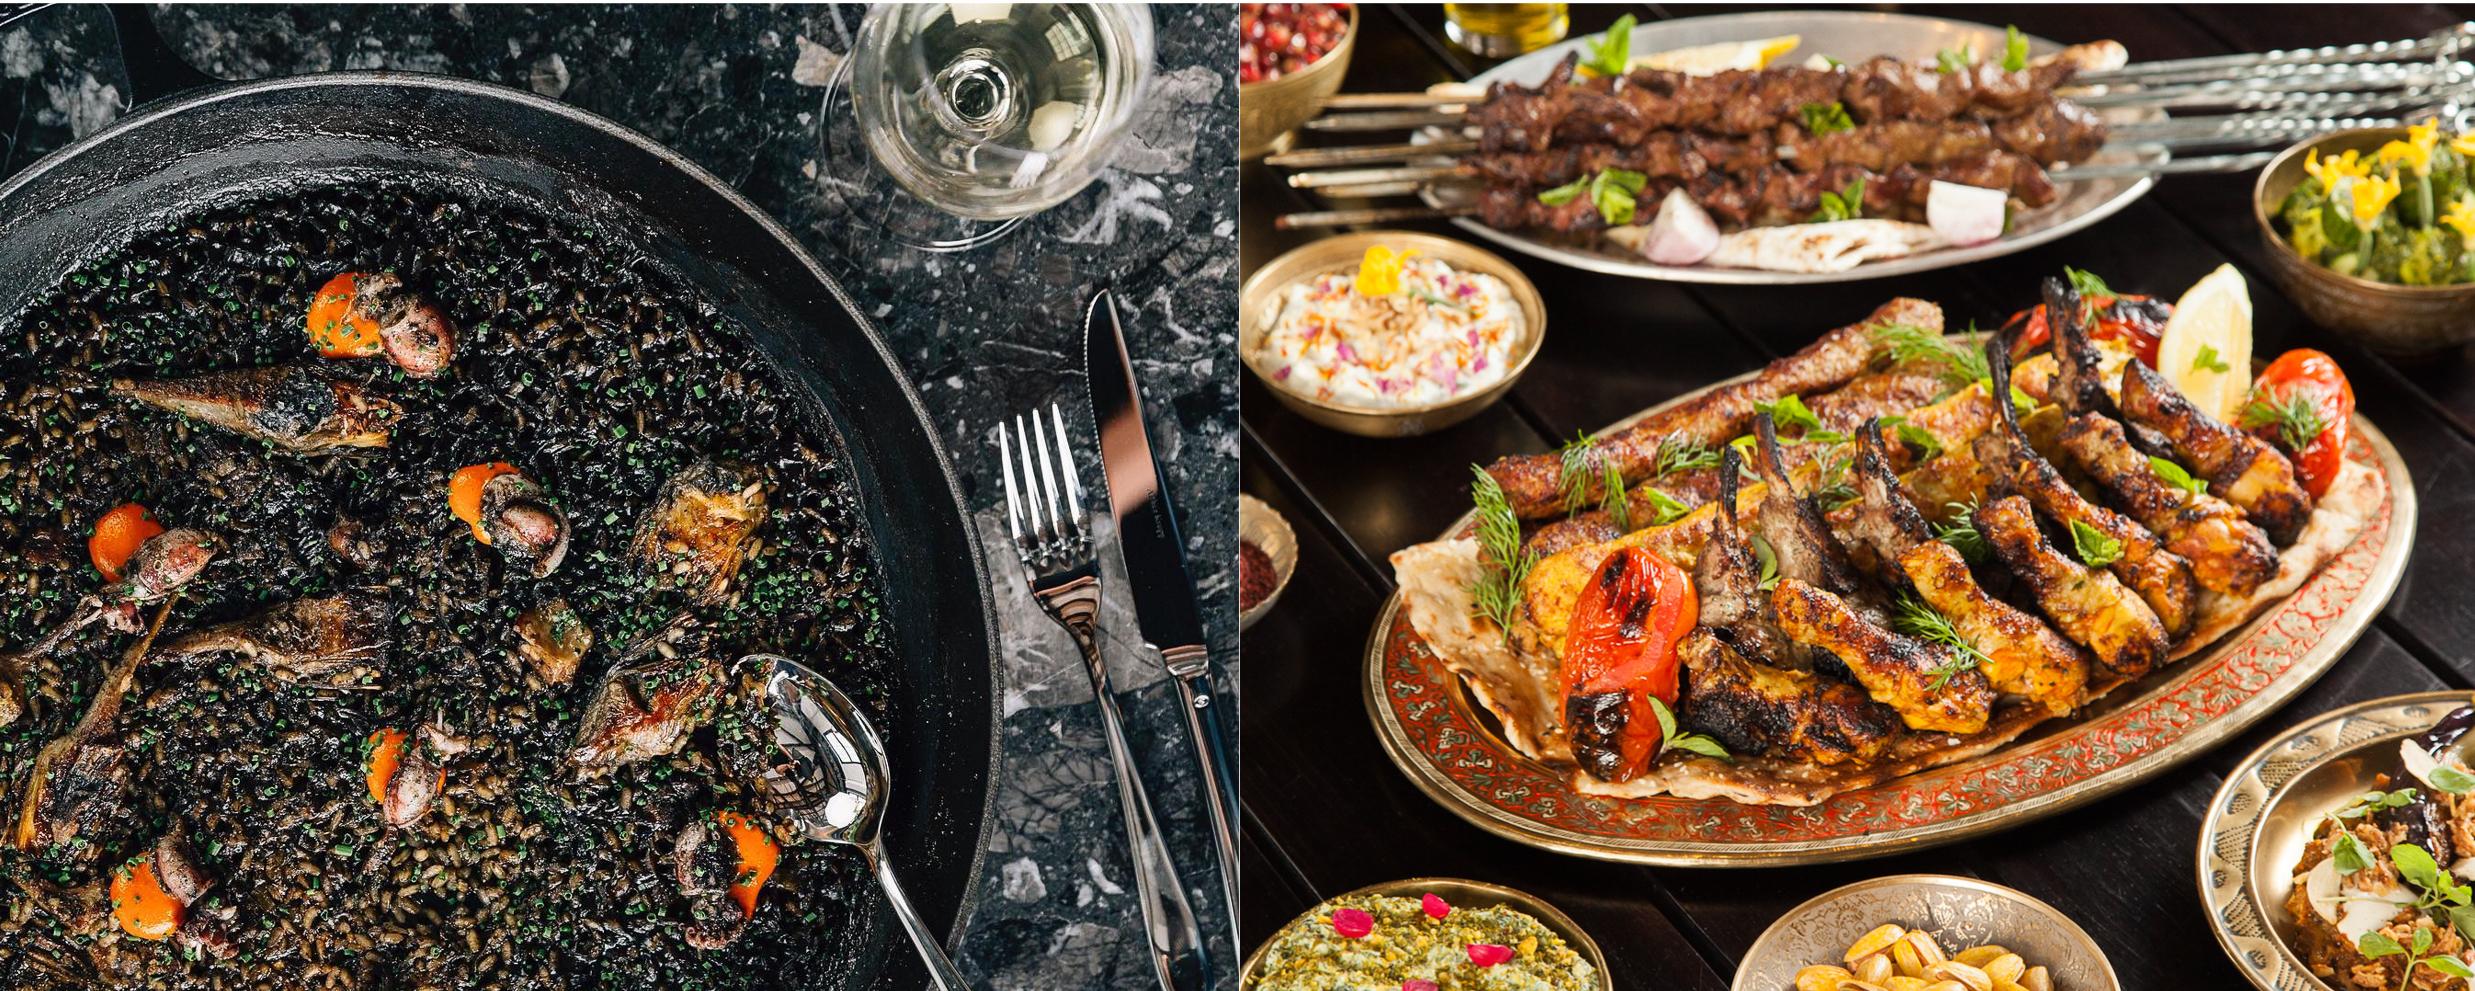 Coal Drops Yard King's Cross restaurant Barrafina and Soho restaurant Berenjak from JKS Restaurants did battle on London restaurant Instagram with Michelin star restaurant Bibendum